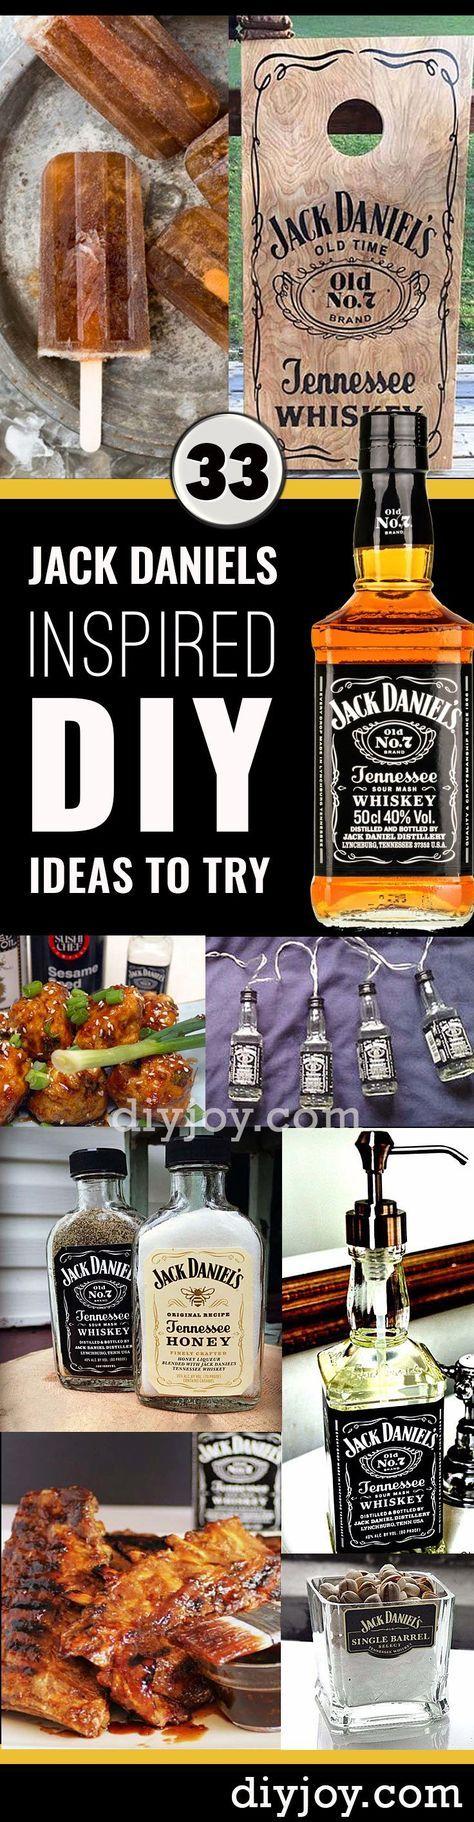 Préférence 79 best Jack Daniels Surprise 40th images on Pinterest | Drinks  OB04